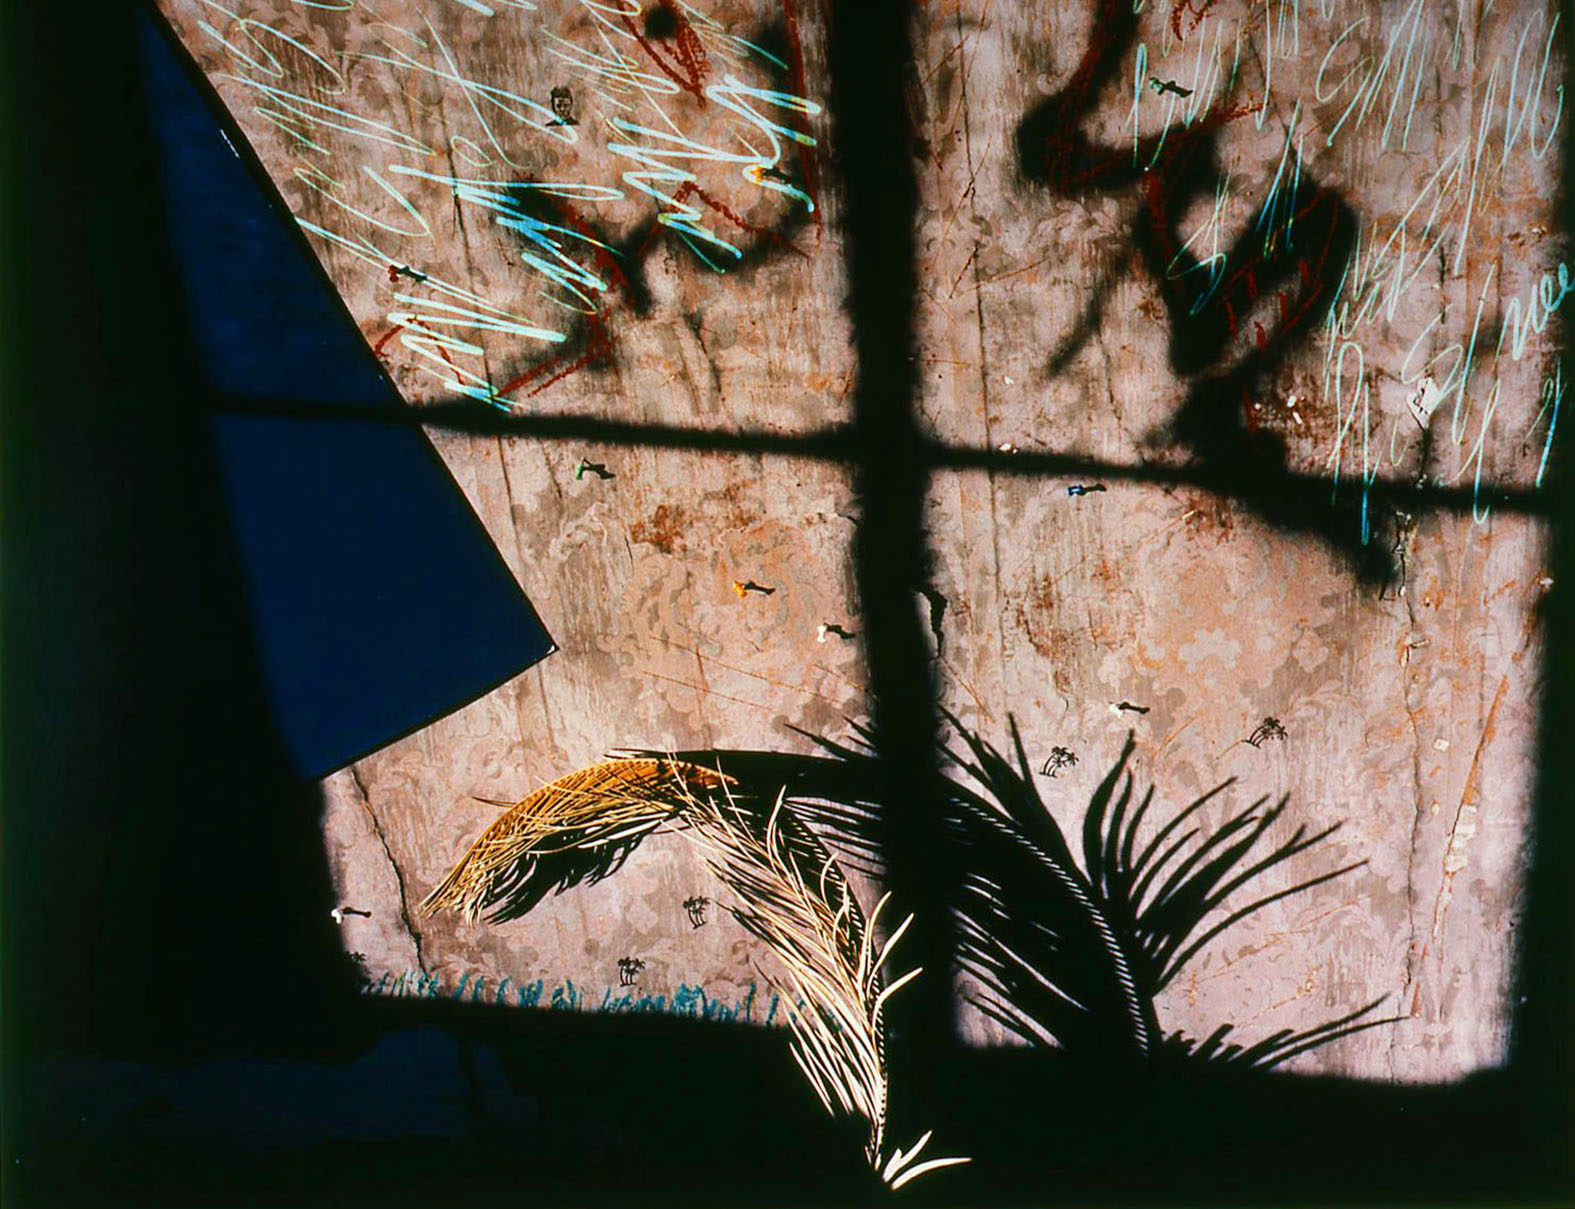 """Studio C Series""/ 2 Faces Talking in Window"", 1985, 20x24"""